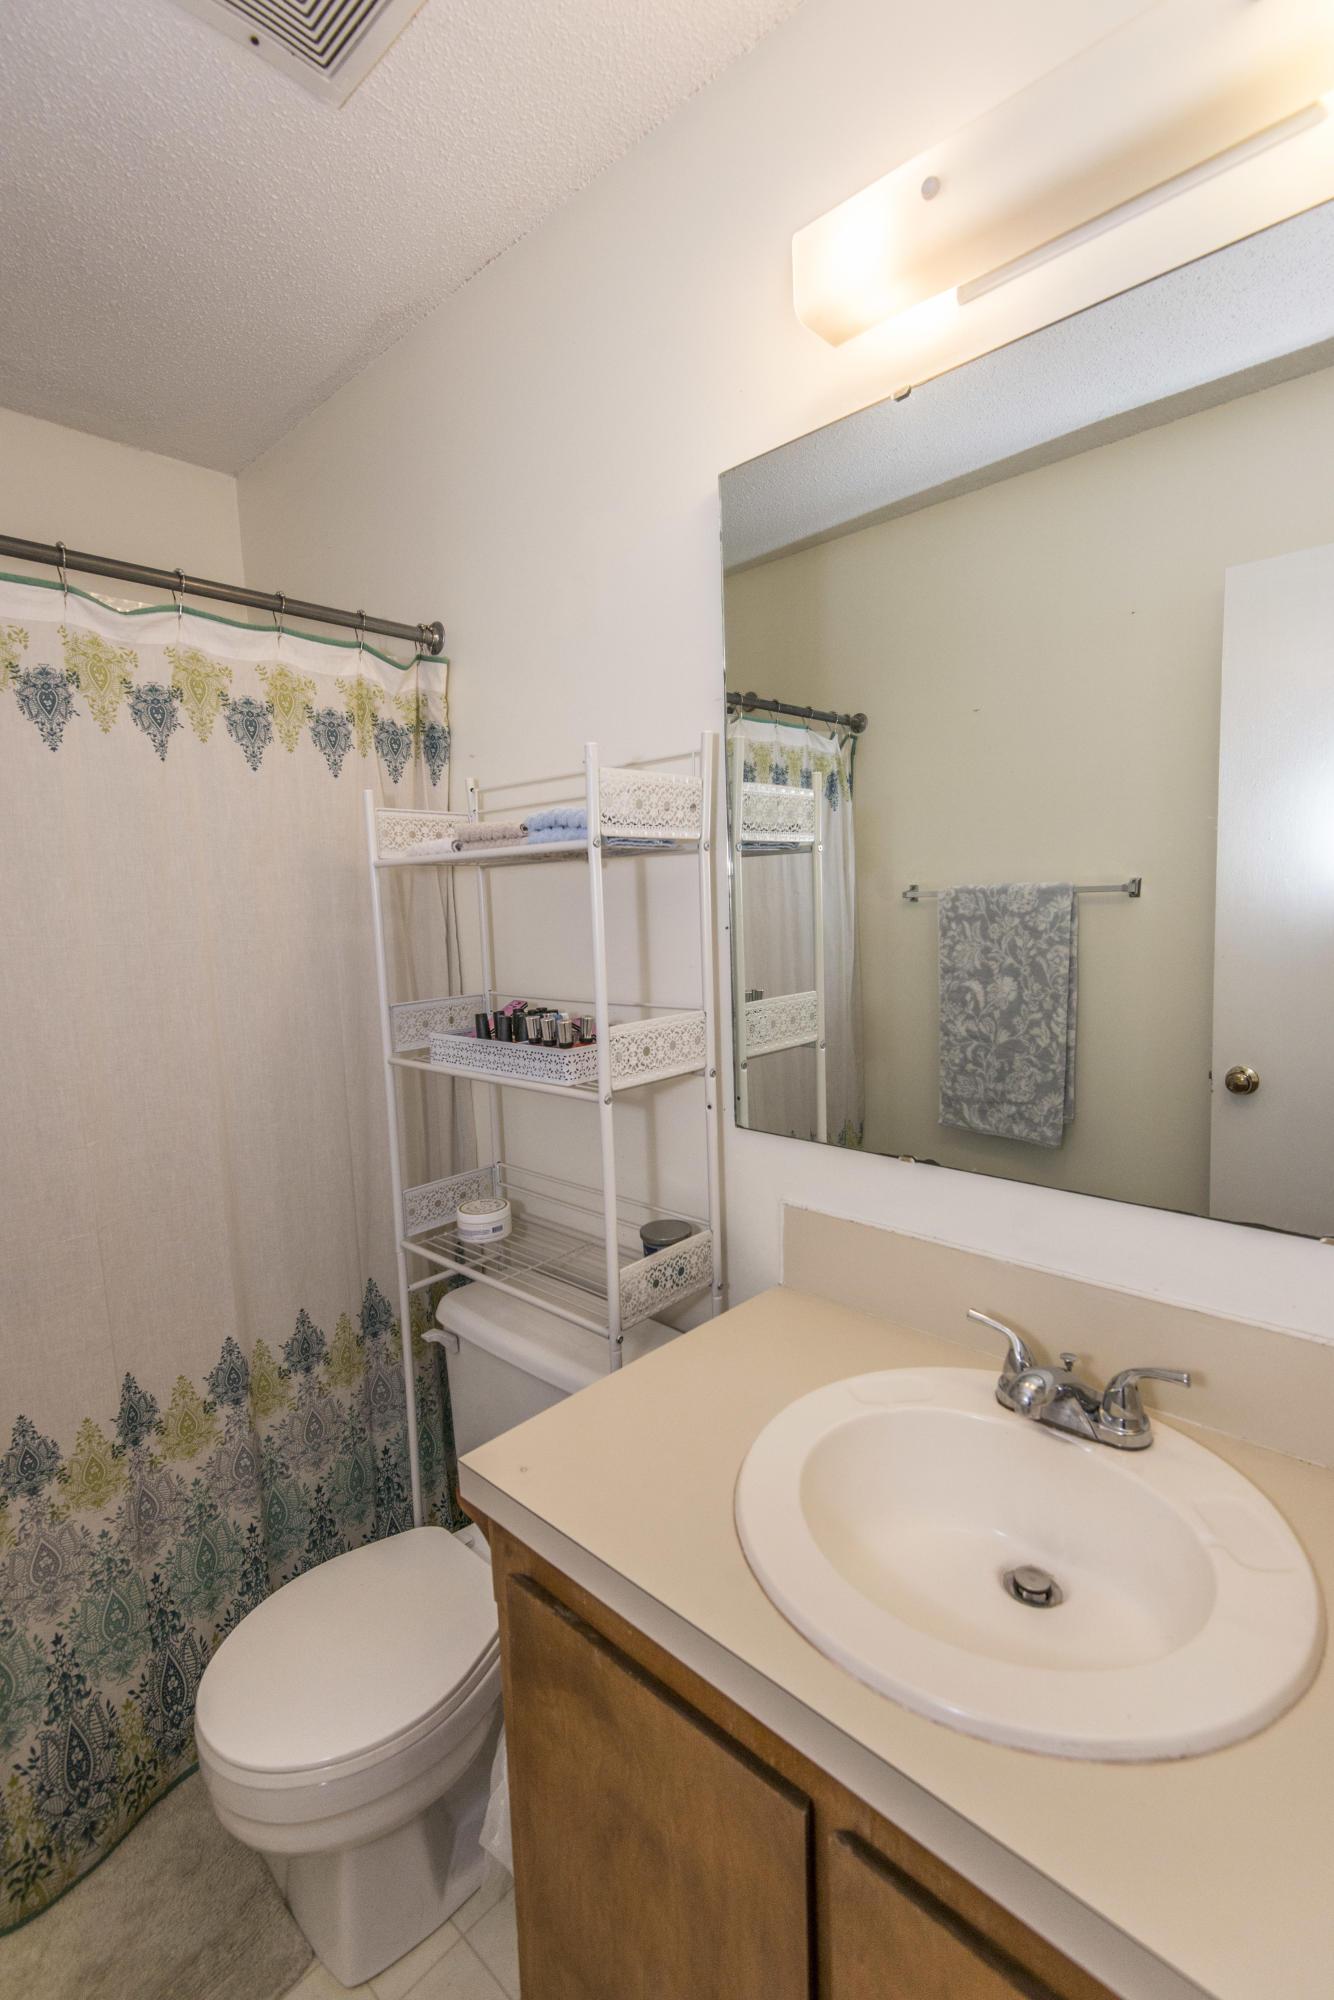 Bel Air Homes For Sale - 1508 Theresa, Charleston, SC - 0